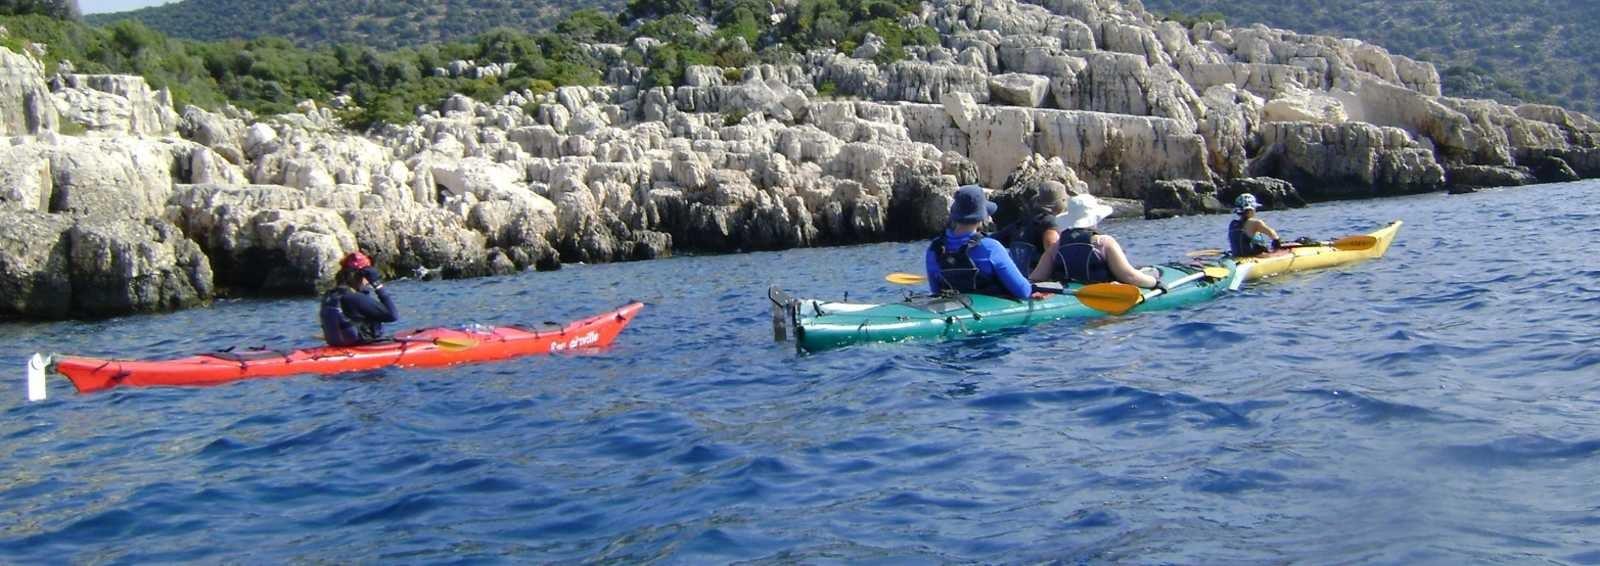 Group heading along the Turqoise Coast, Turkey.